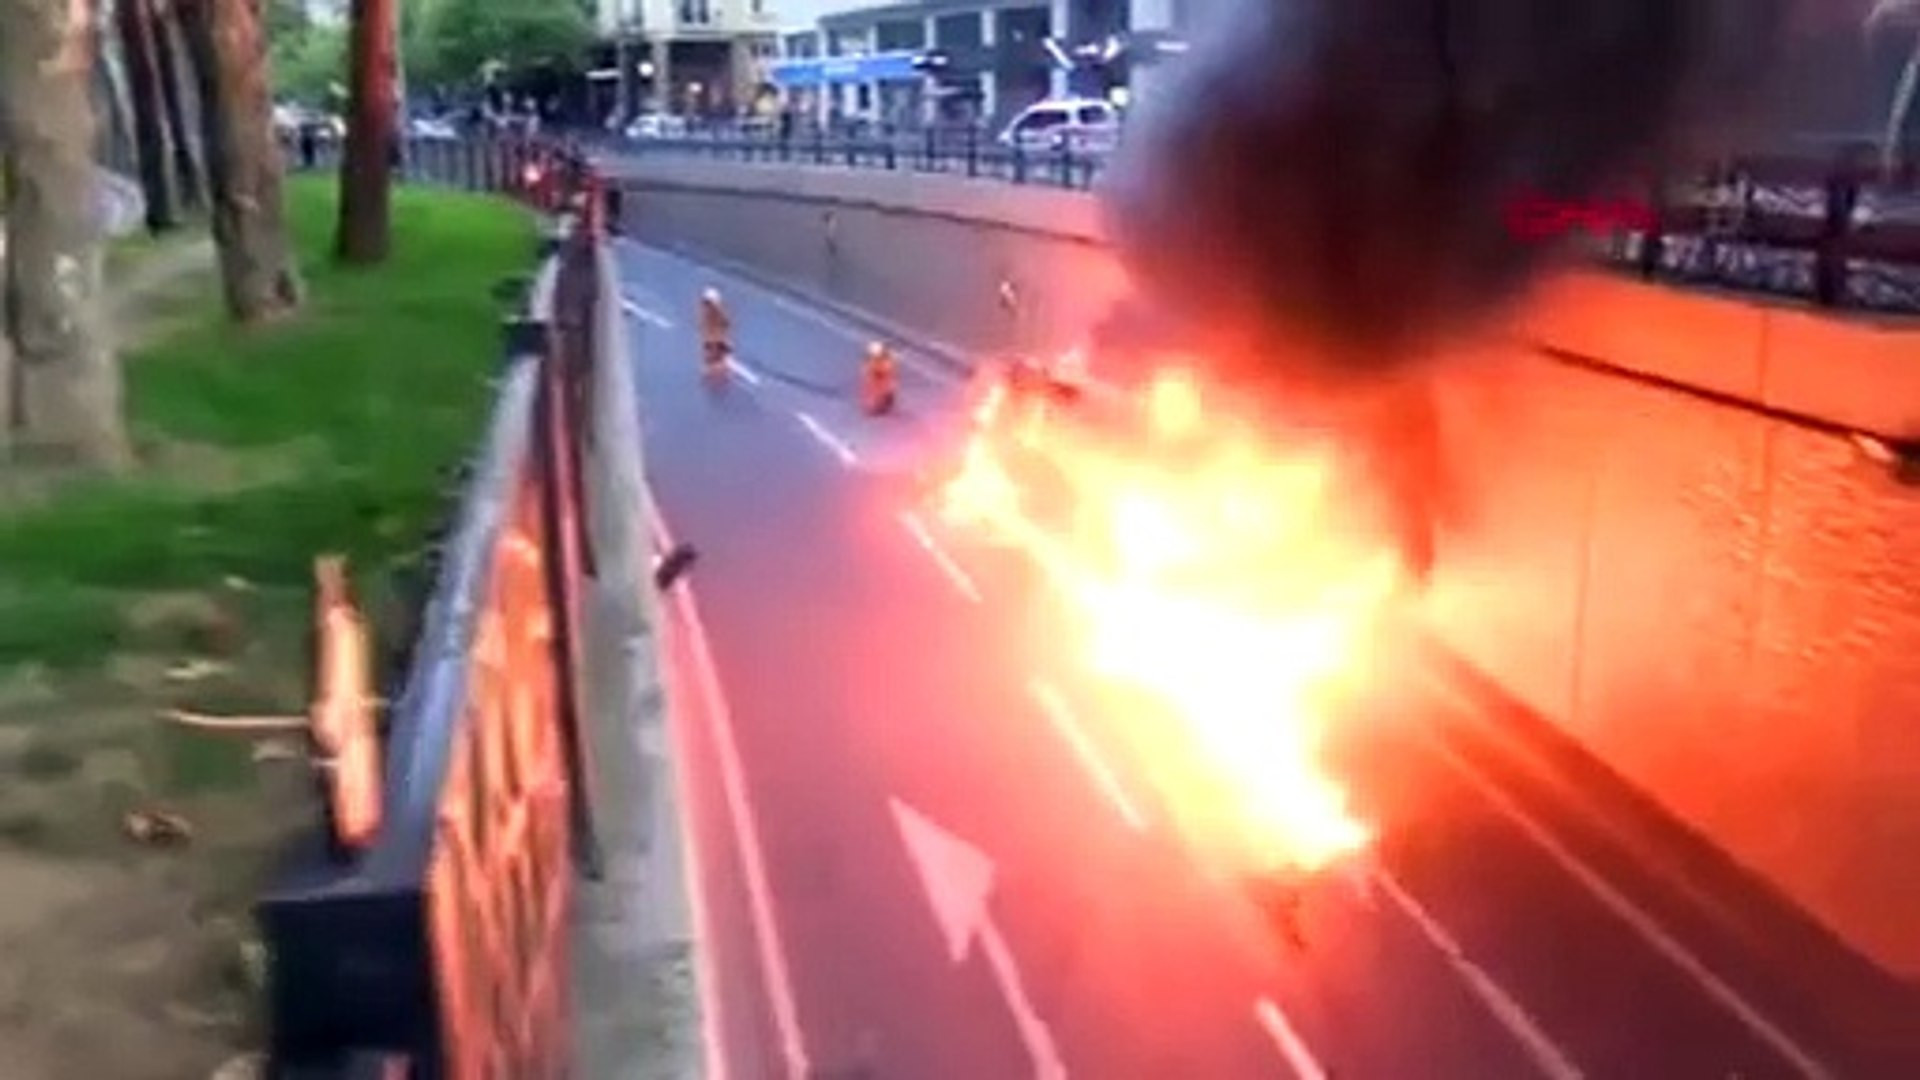 İstanbul'da korku dolu anlar! Öğrenci servisi alev alev yandı